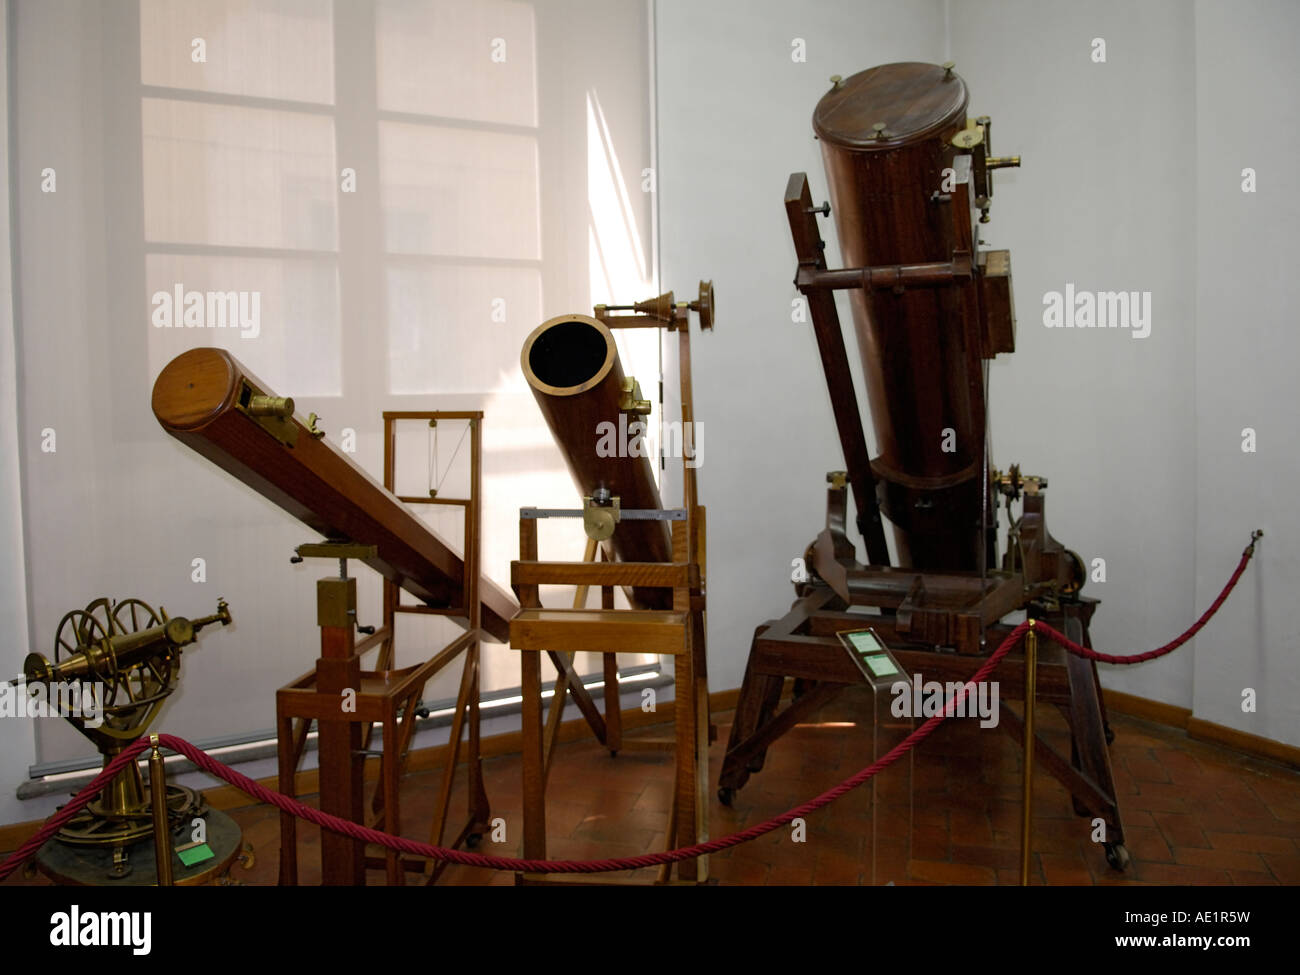 Antique telescopes, Museo Galileo, Florence, Italy - Stock Image